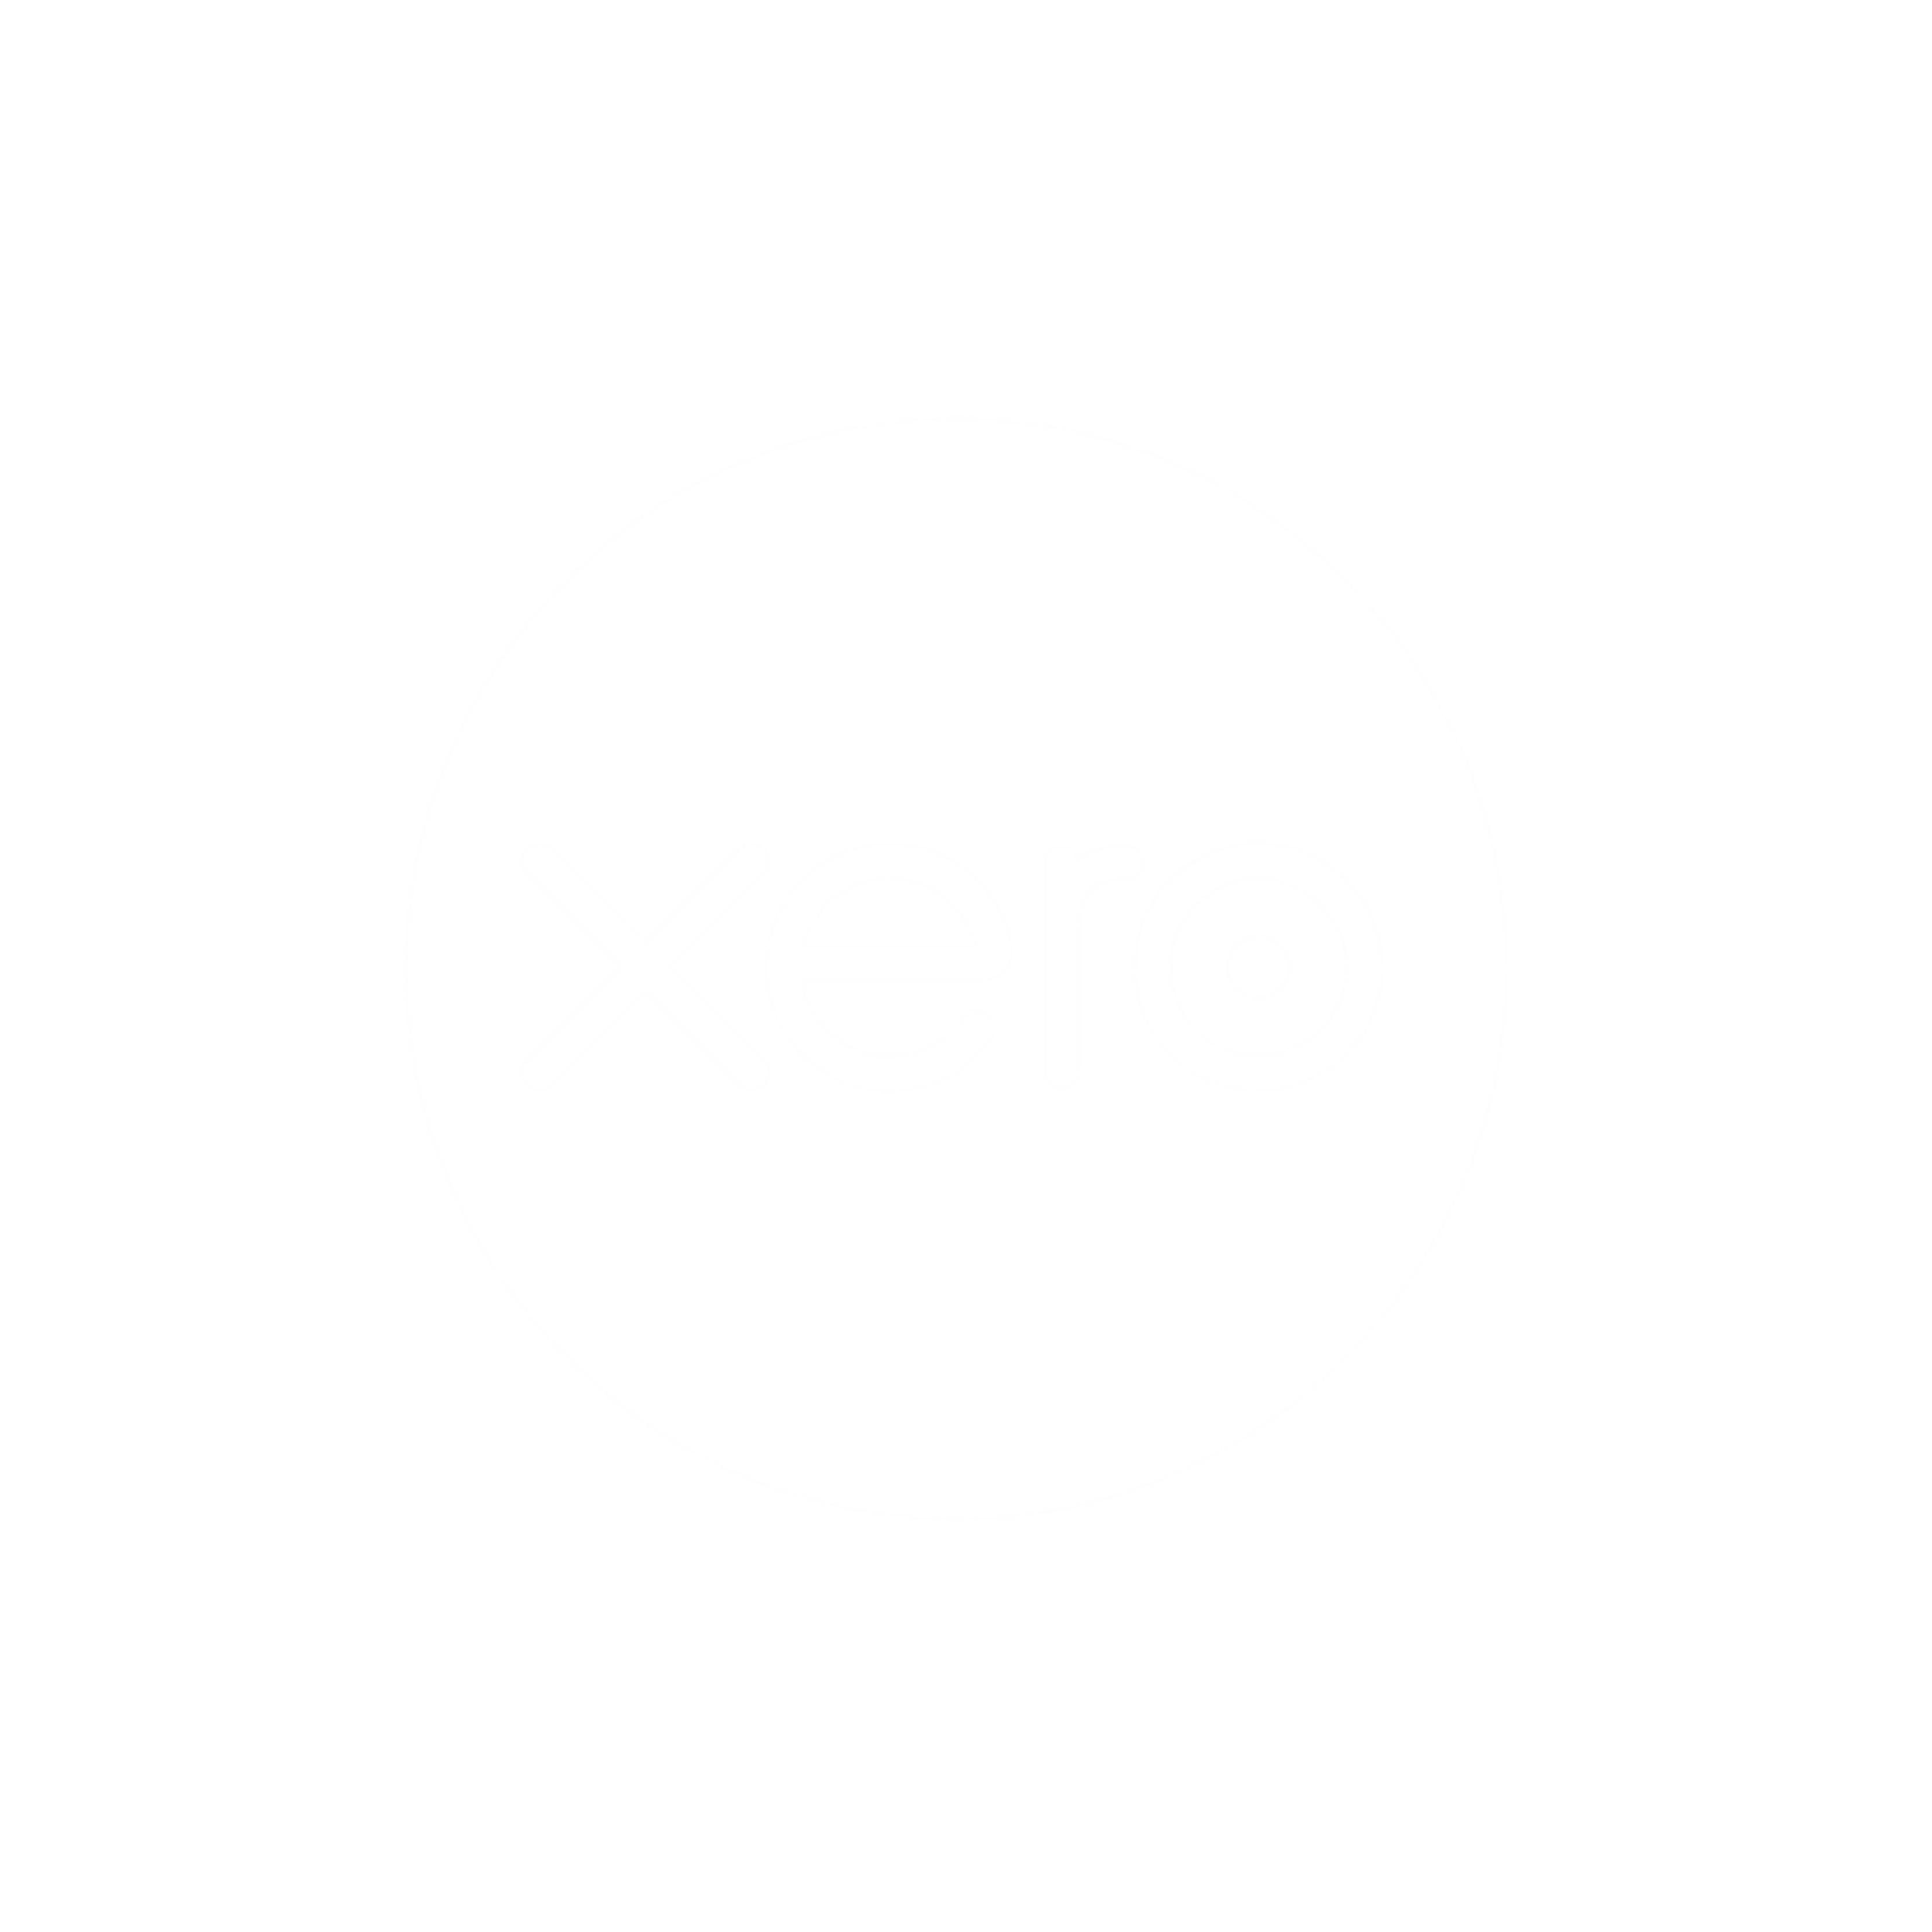 Xero Integrity Partnership Digital Partner